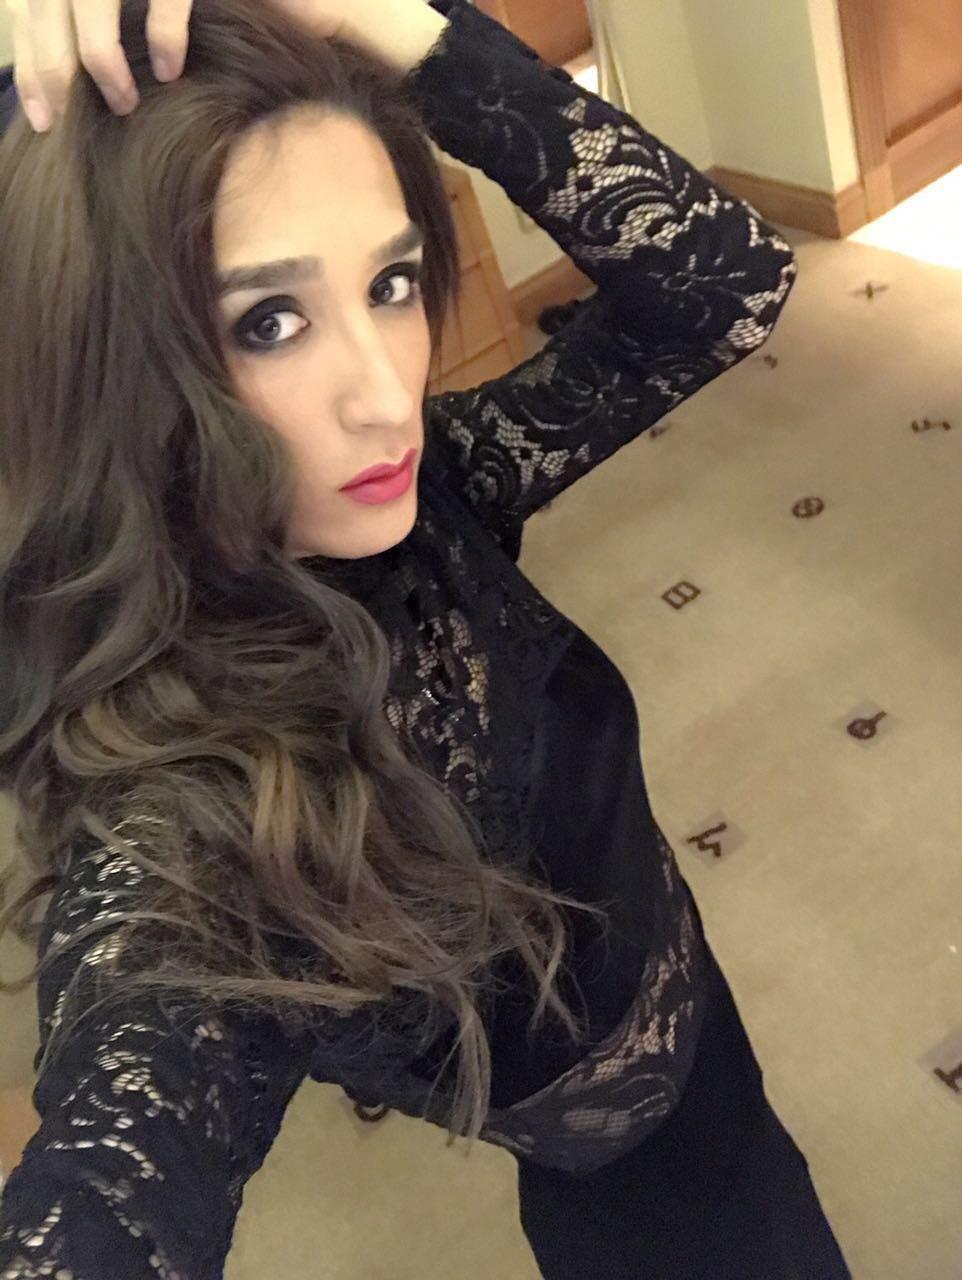 ... Shemale Turkish Rose Huge Dick +971529183752 Dubai - 4 ...